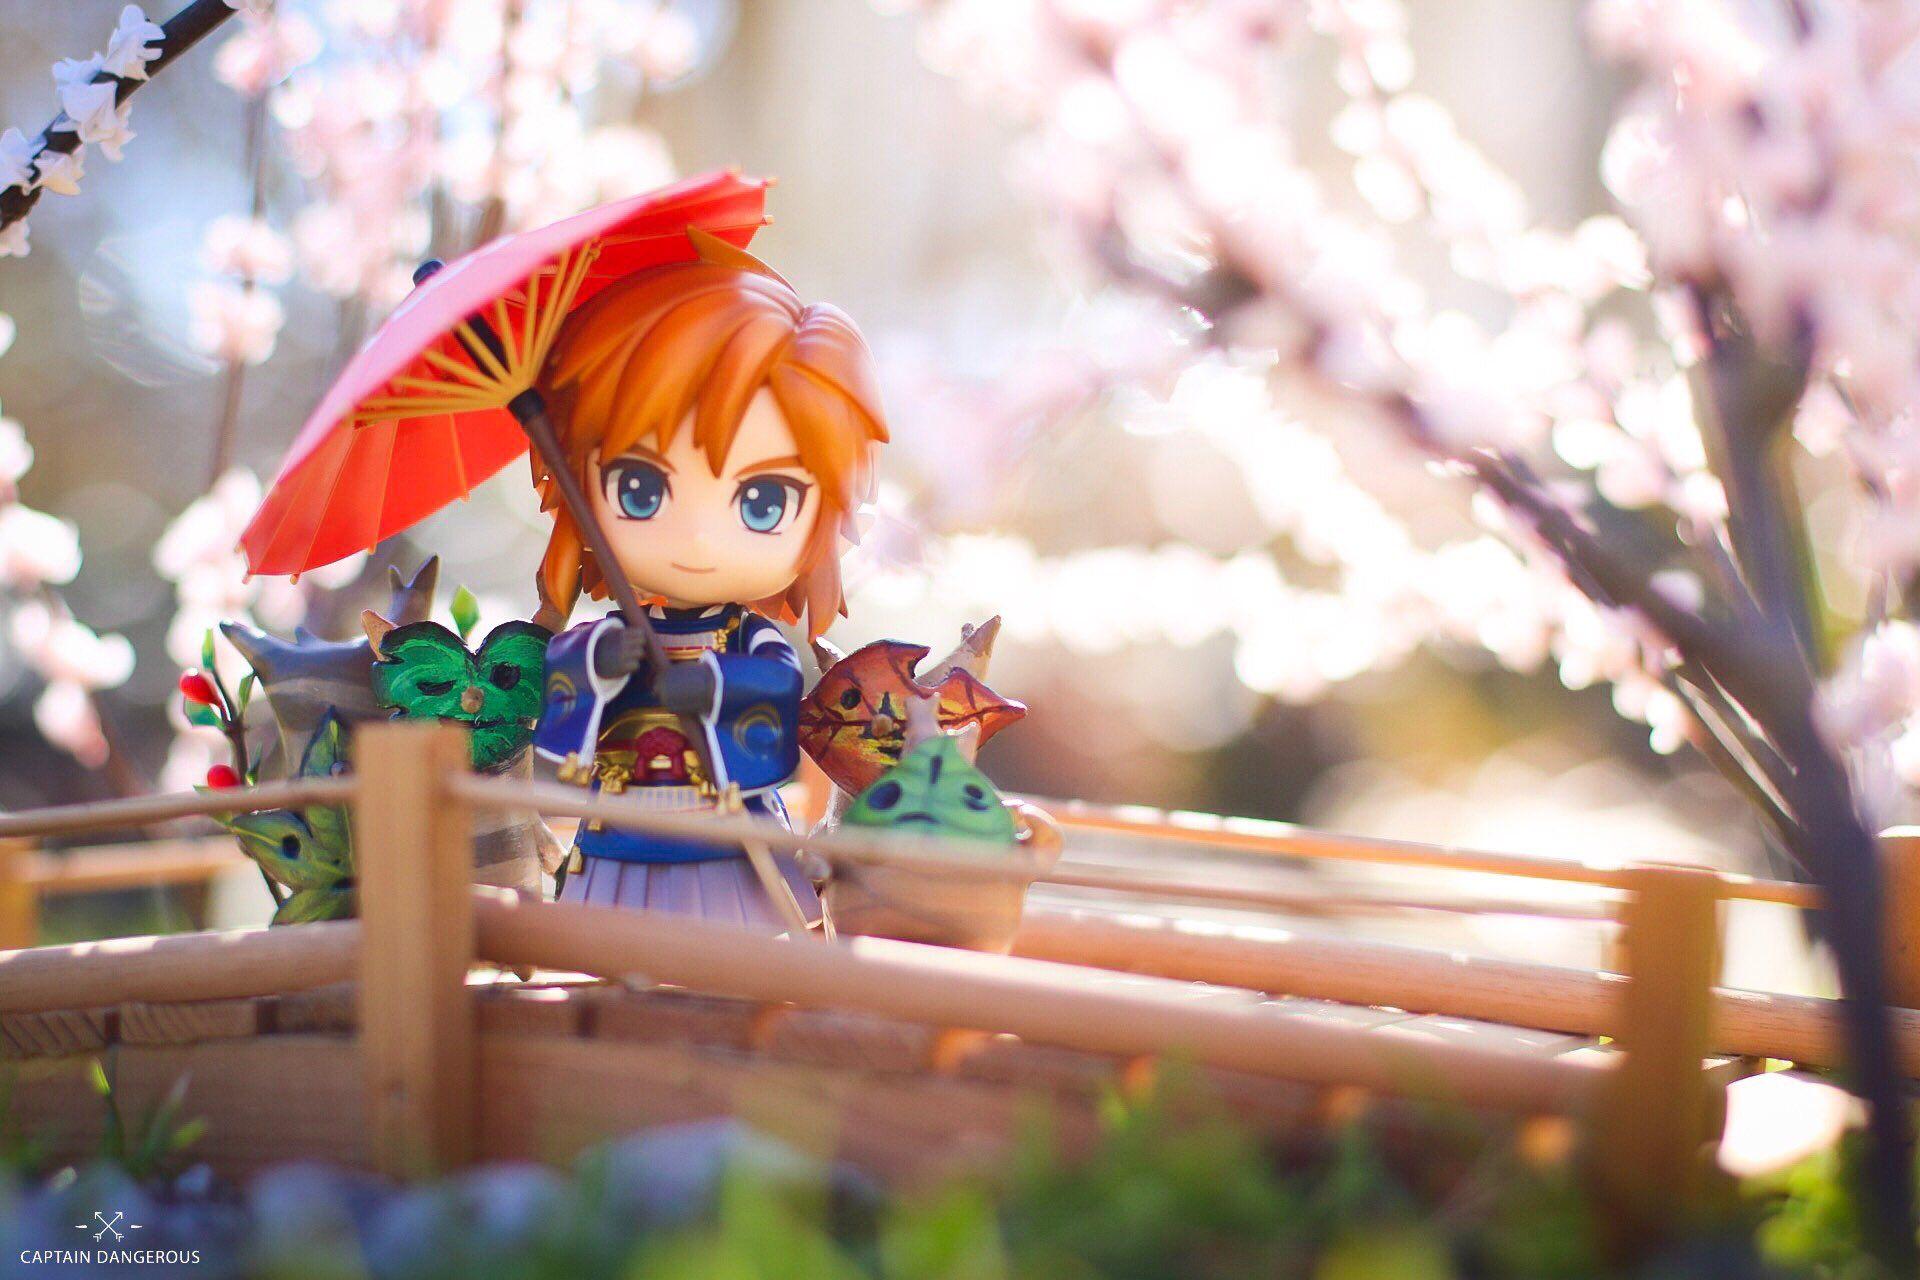 Cute Link Link Chibi Sakura Tree Anime Figures